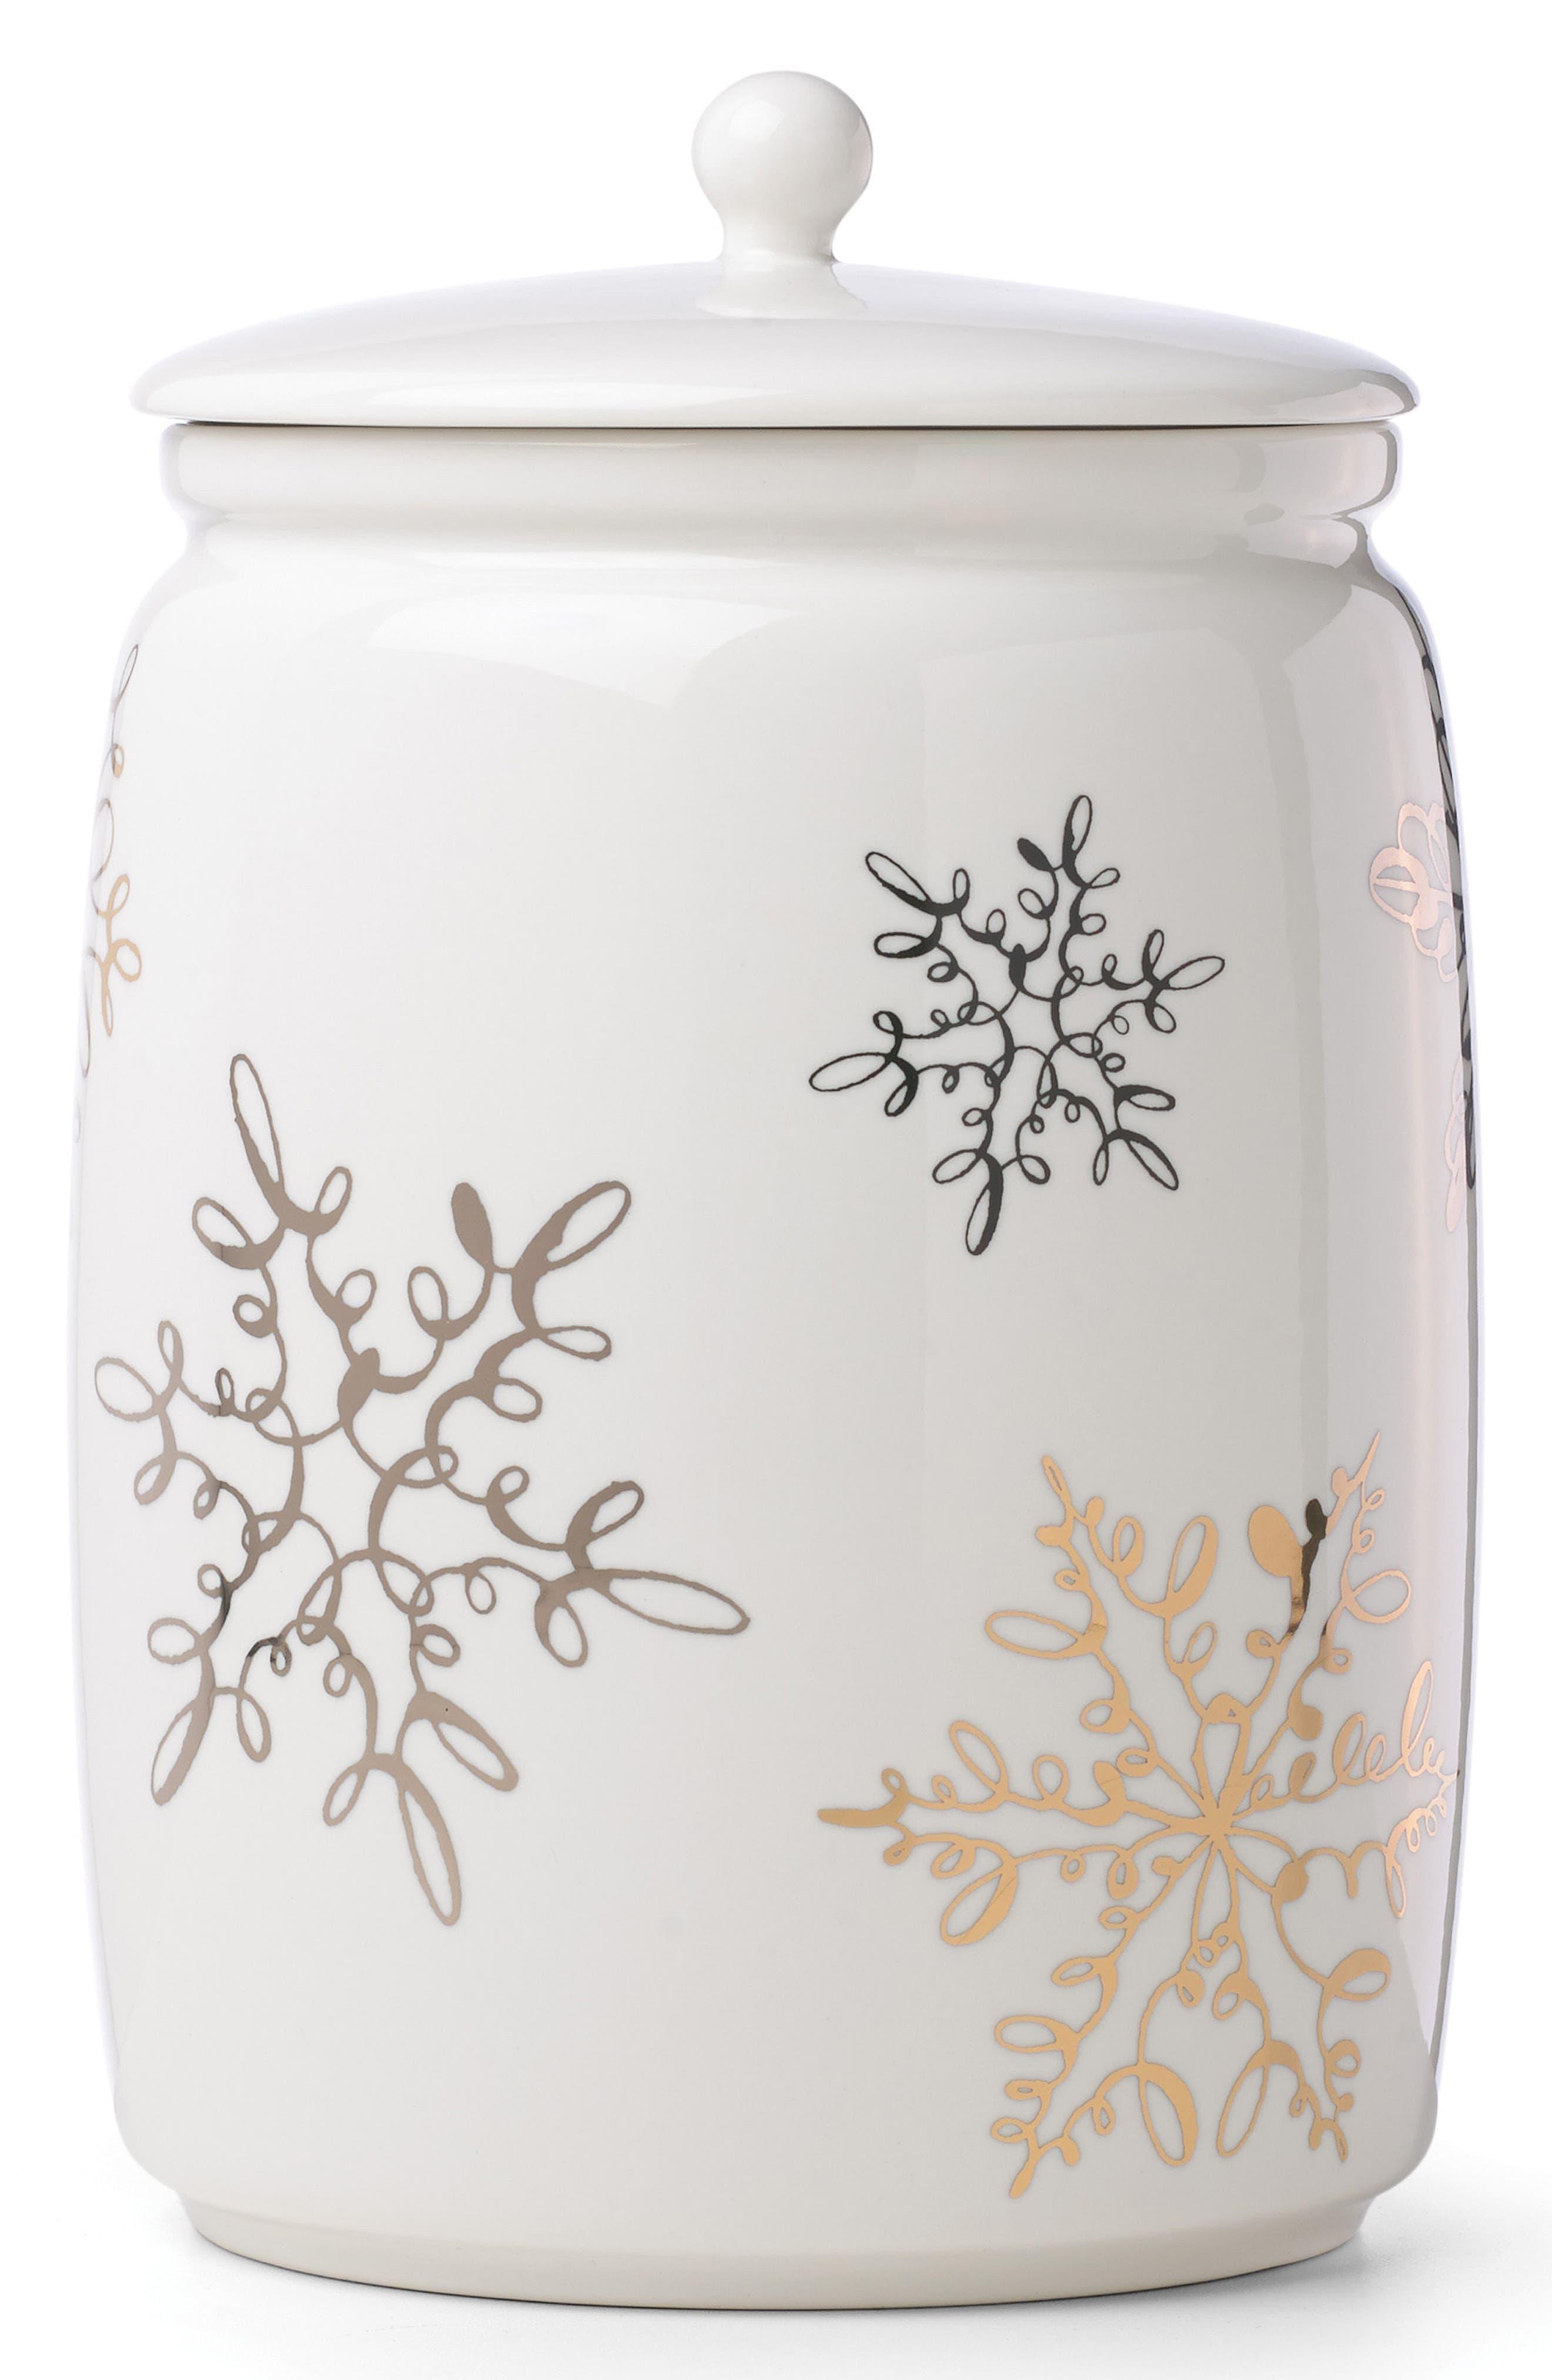 jingle all the way porcelain cookie jar,                             Main thumbnail 1, color,                             100